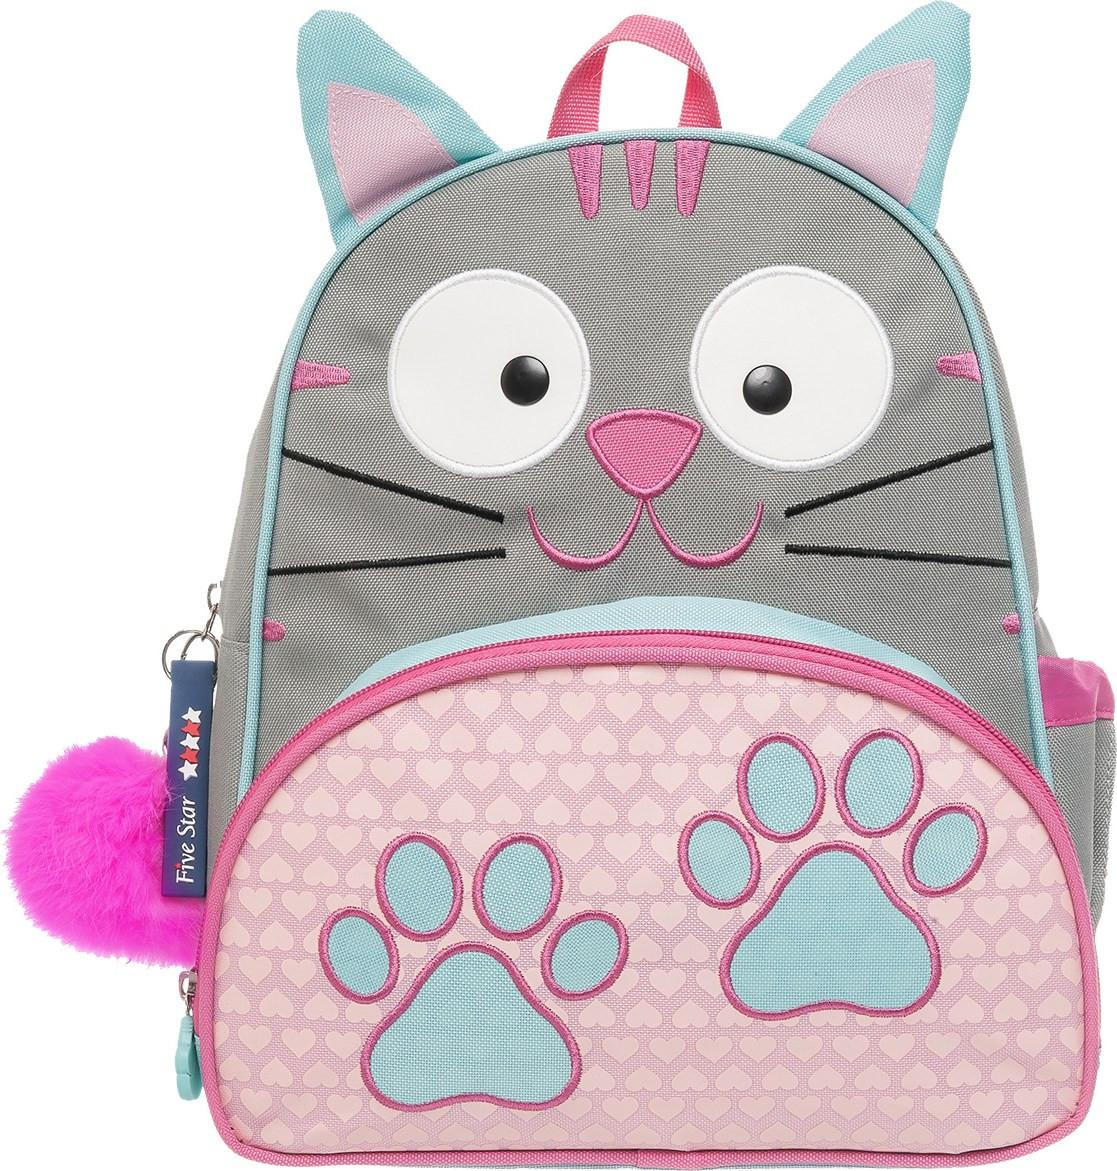 9f4a6d7a41 τσαντα γατα - Σχολικές Τσάντες